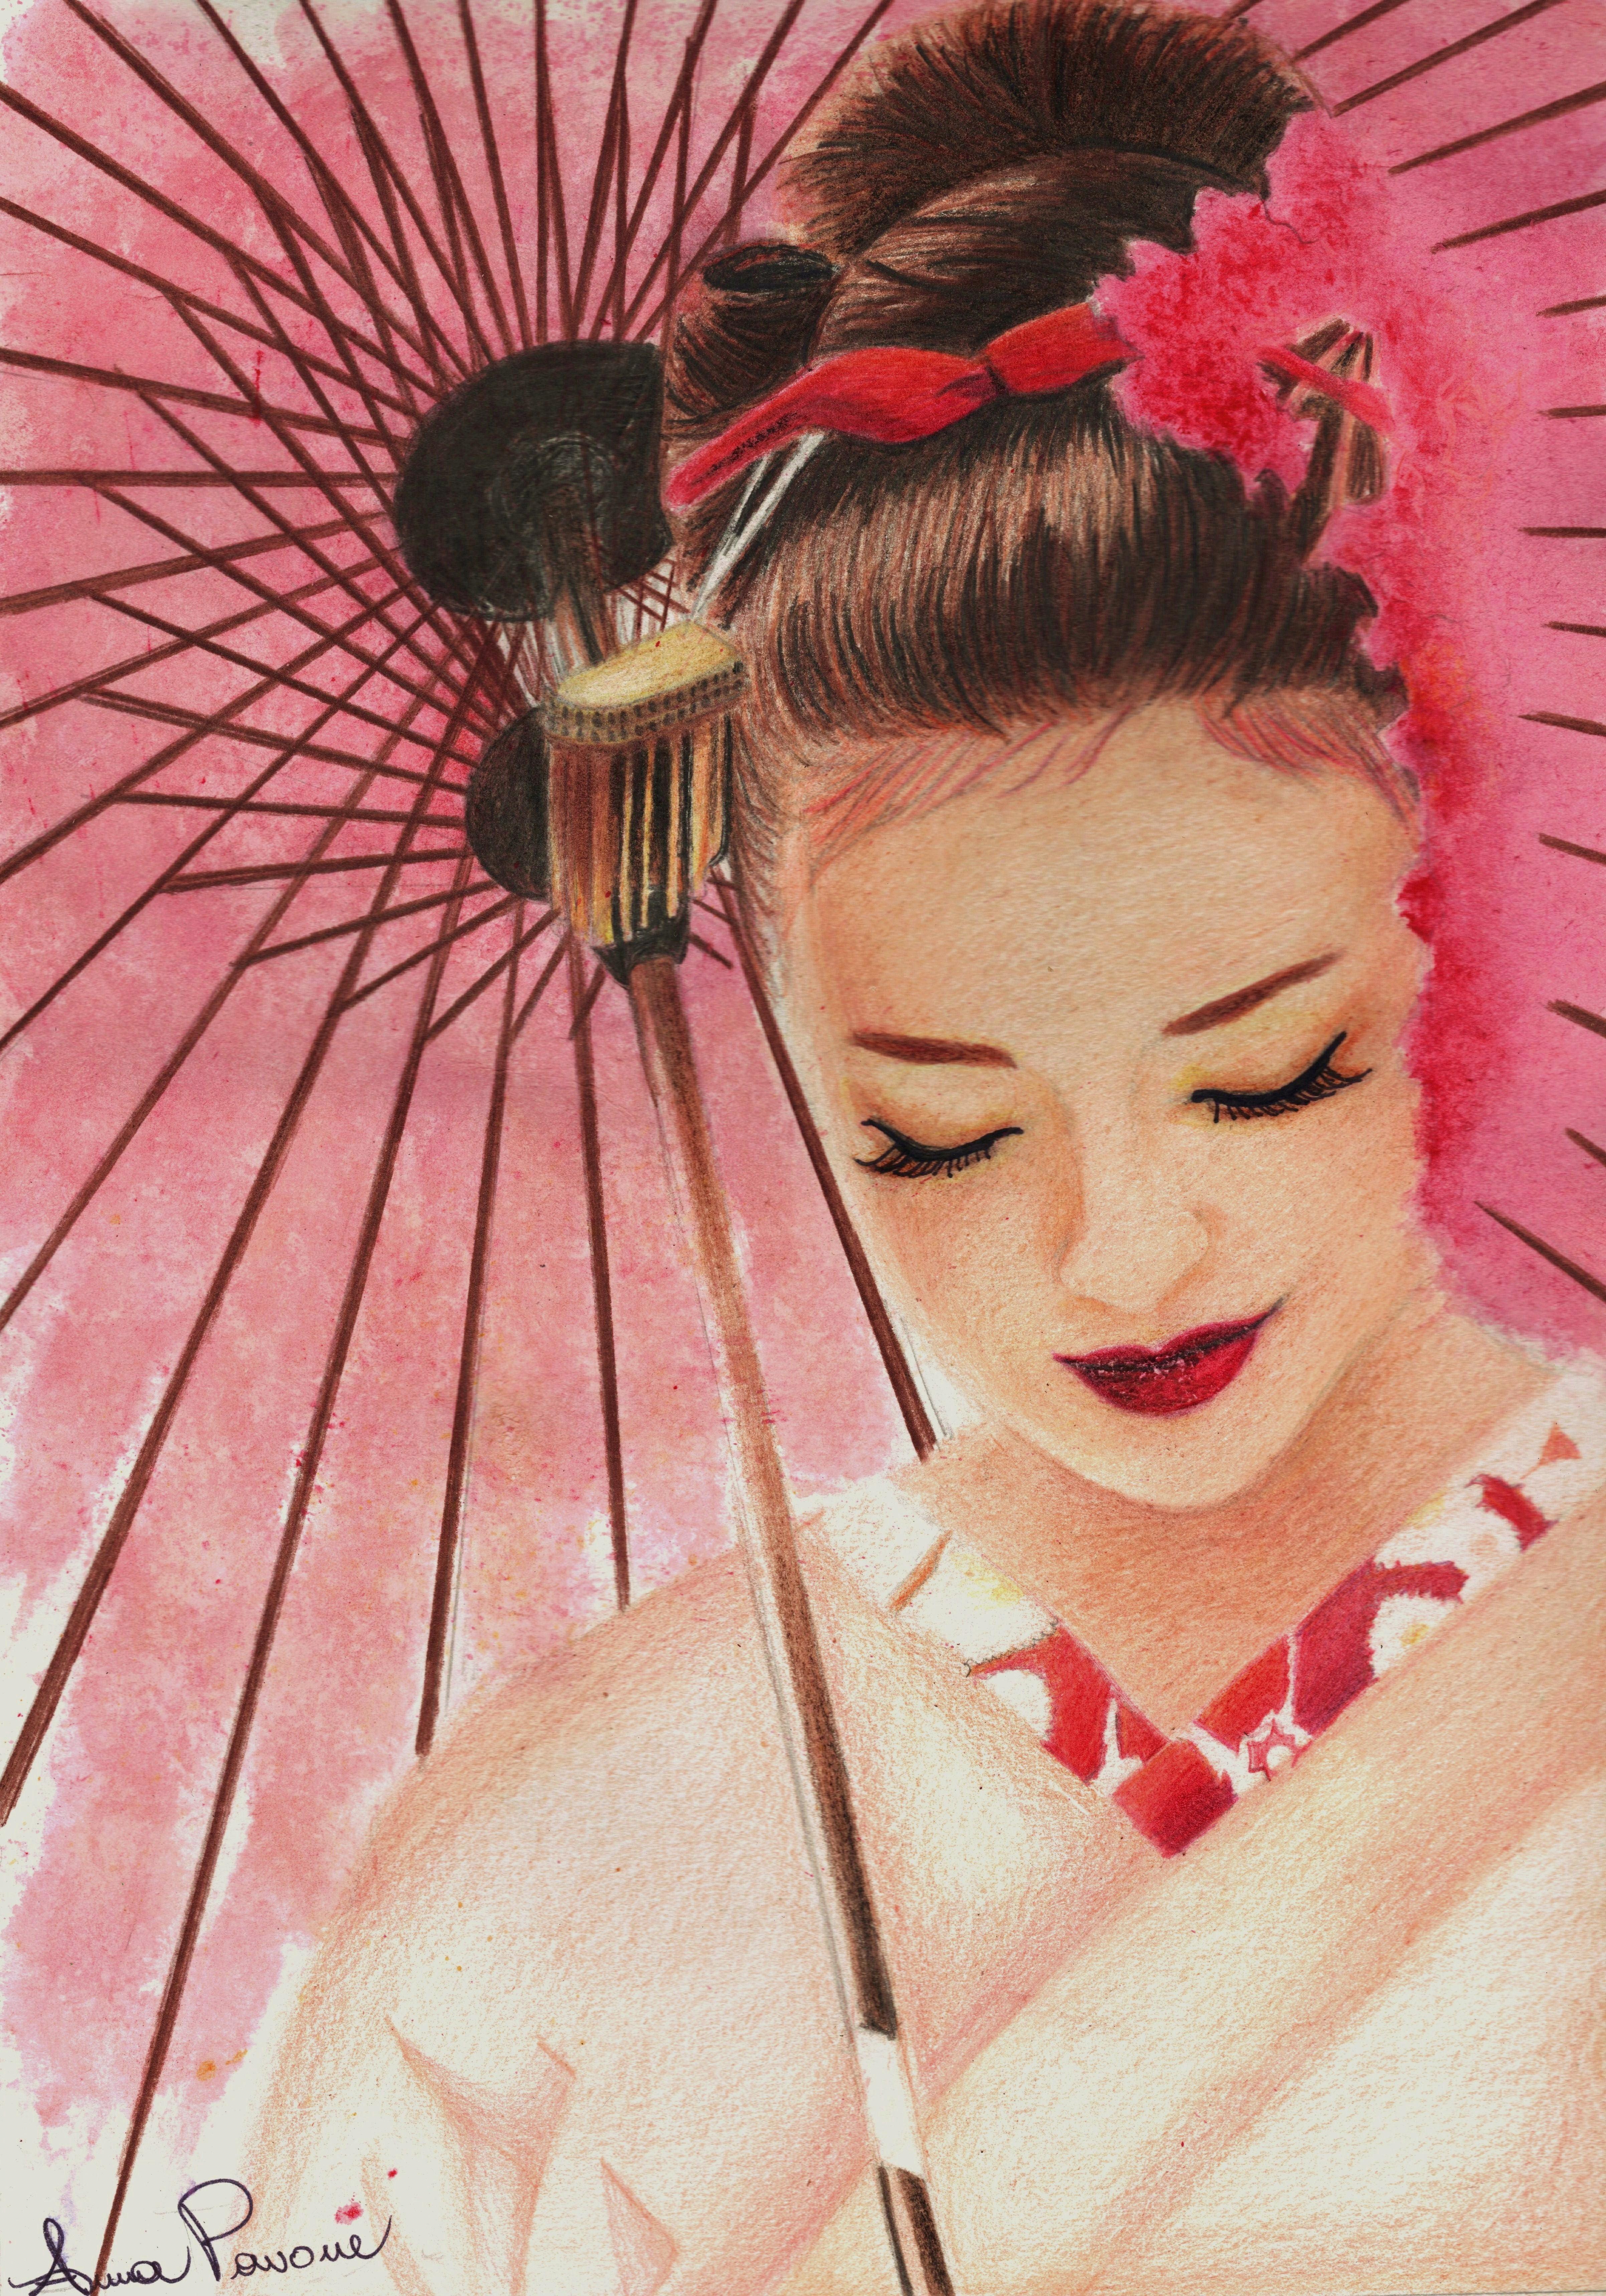 Sayuri by AoiSayzuki